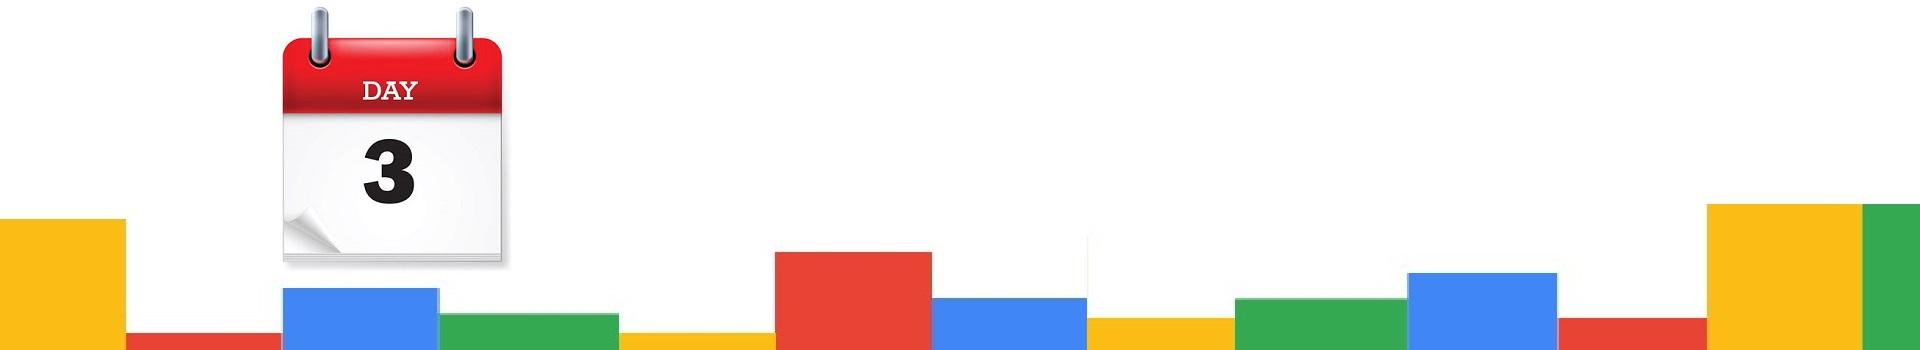 Google Day 3